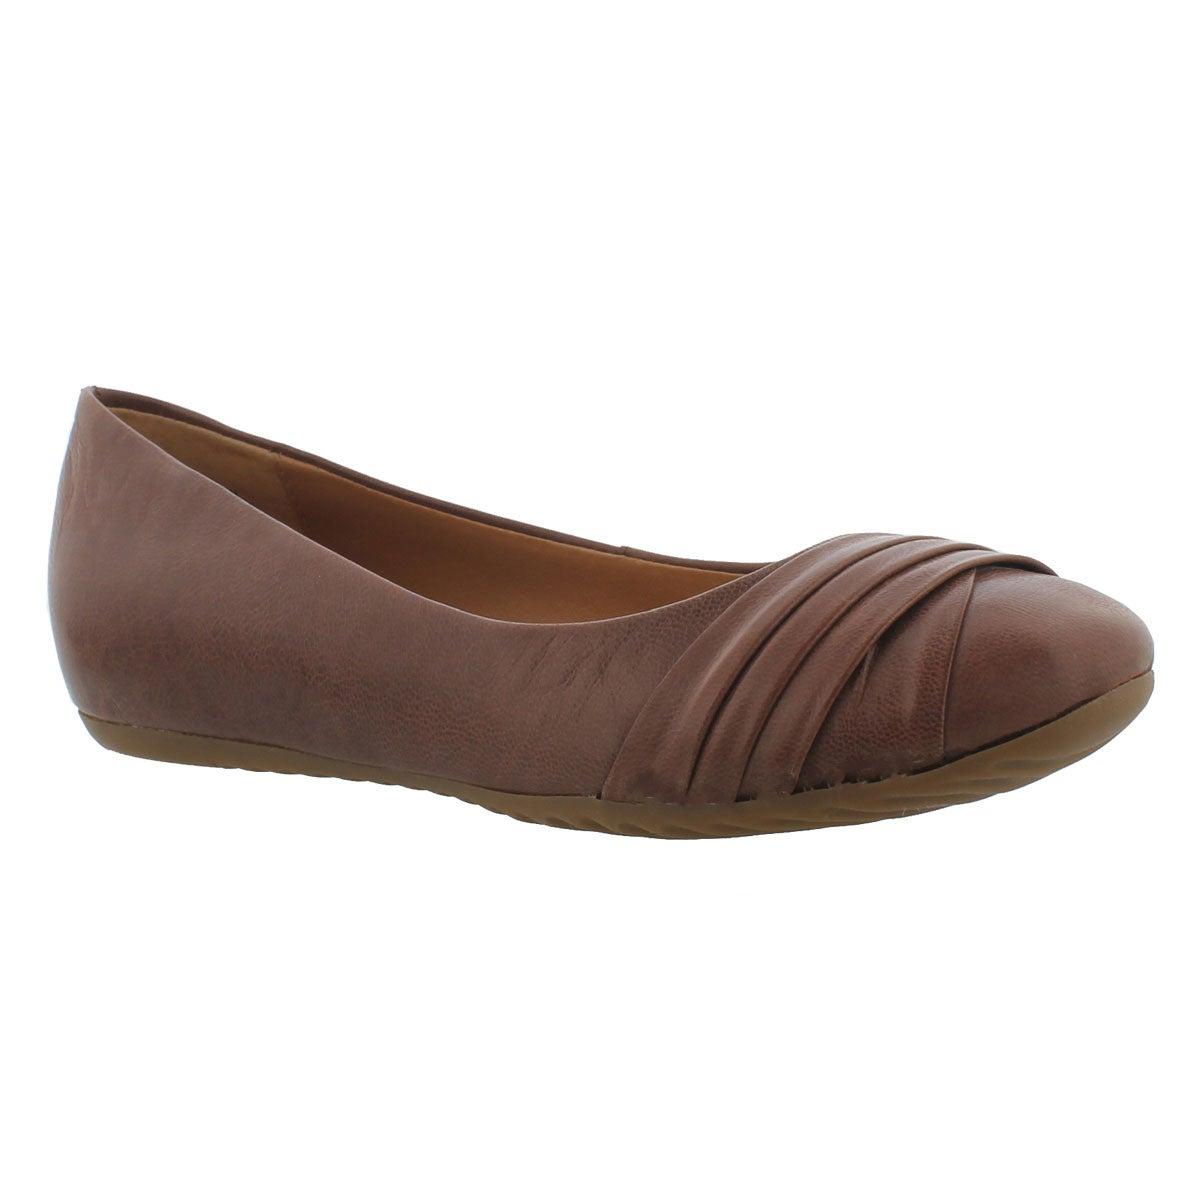 Lds Emily cognac leather ballerina flat